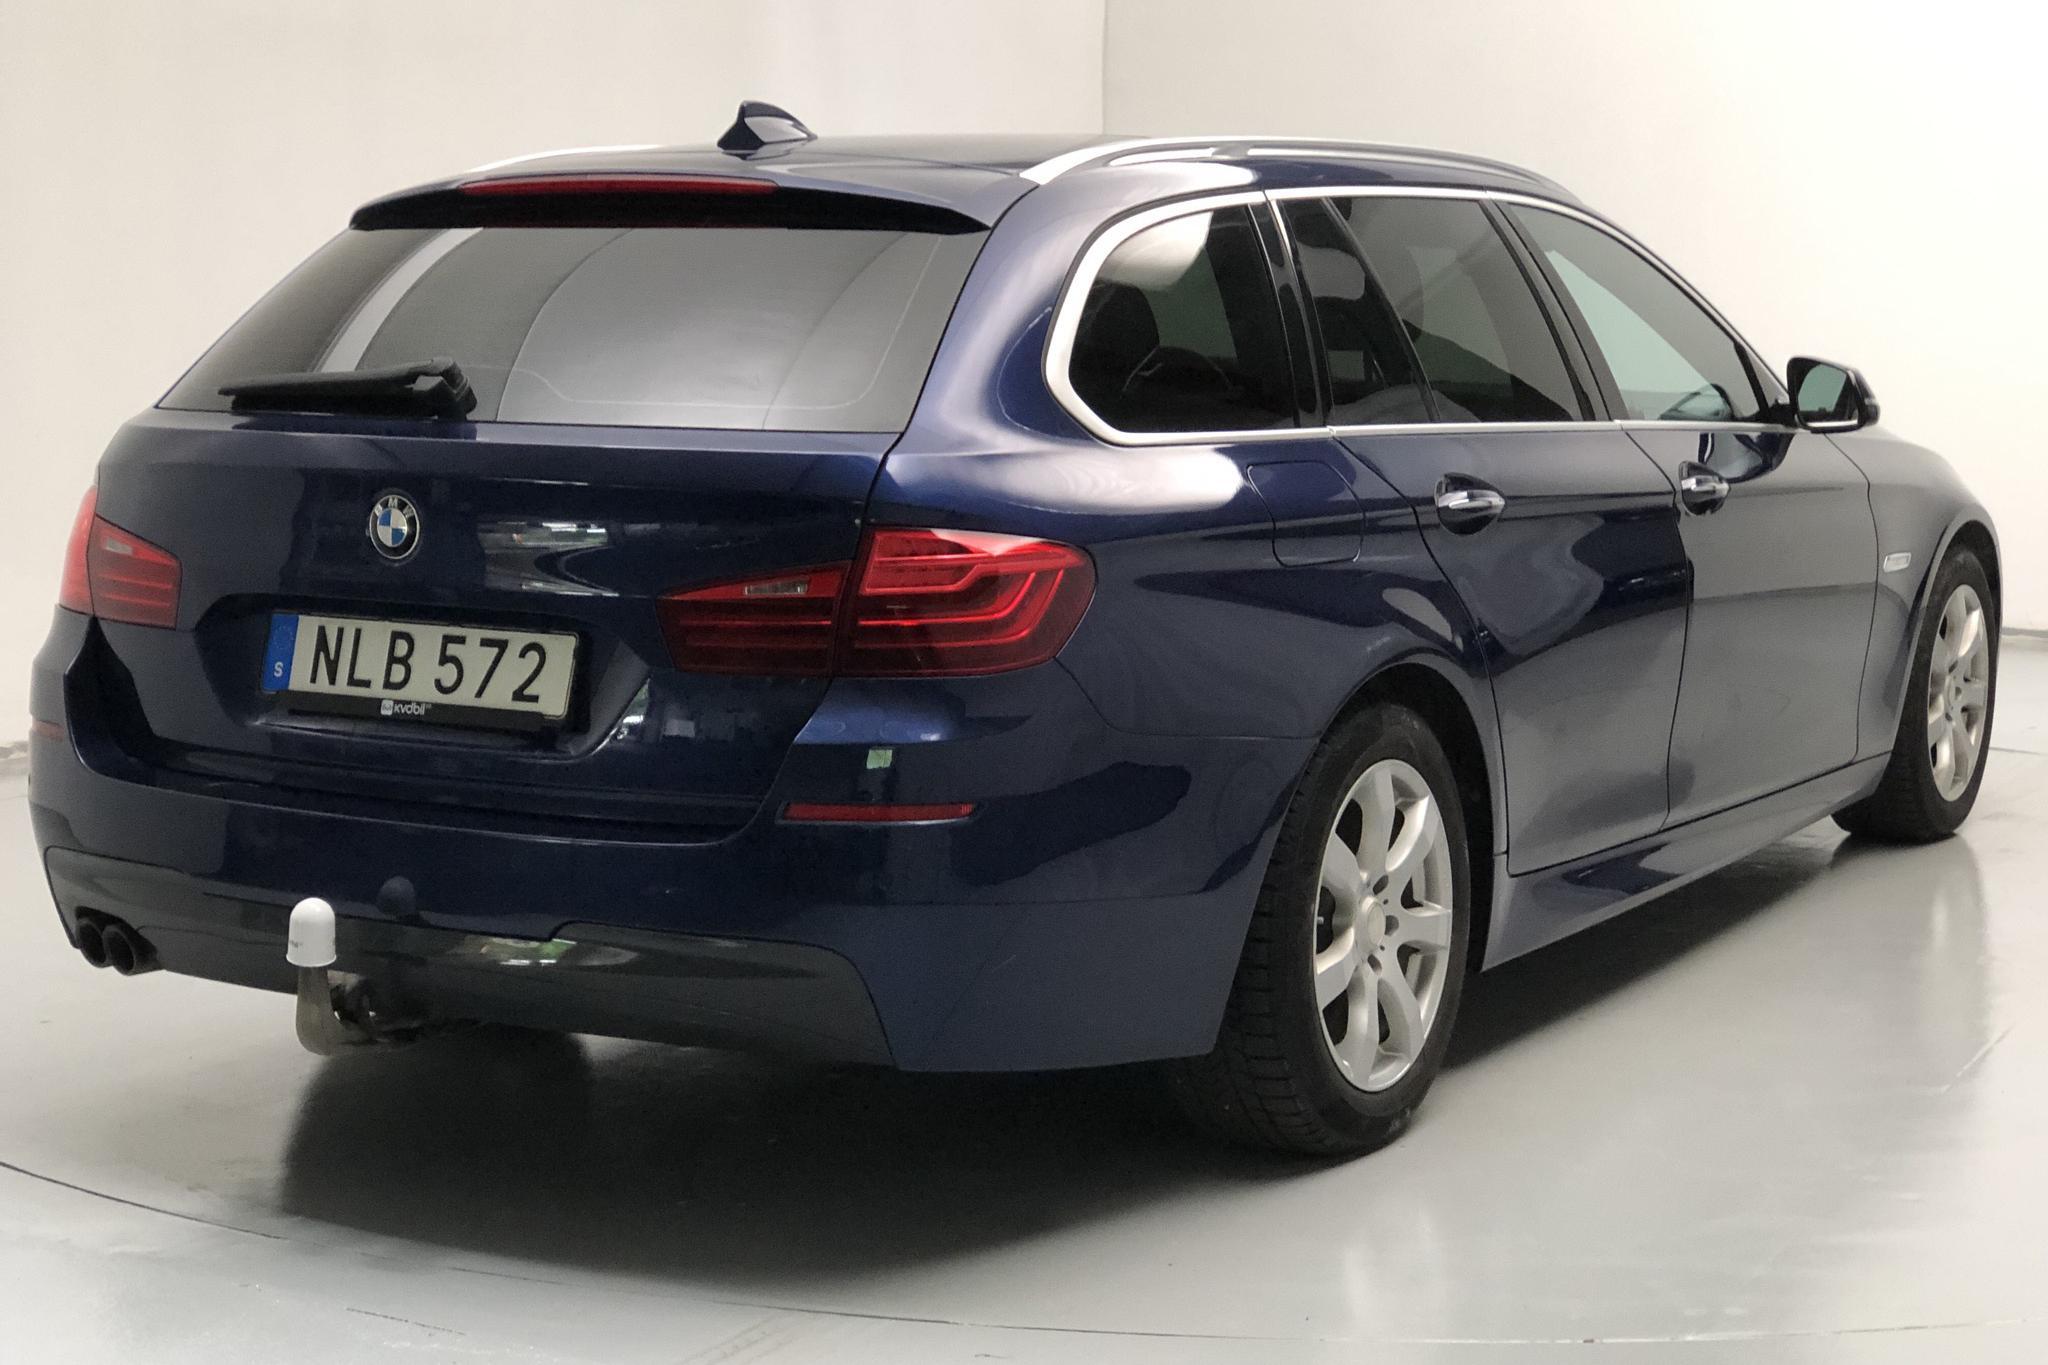 BMW 520d xDrive Touring, F11 (190hk) - 154 900 km - Automatic - blue - 2017